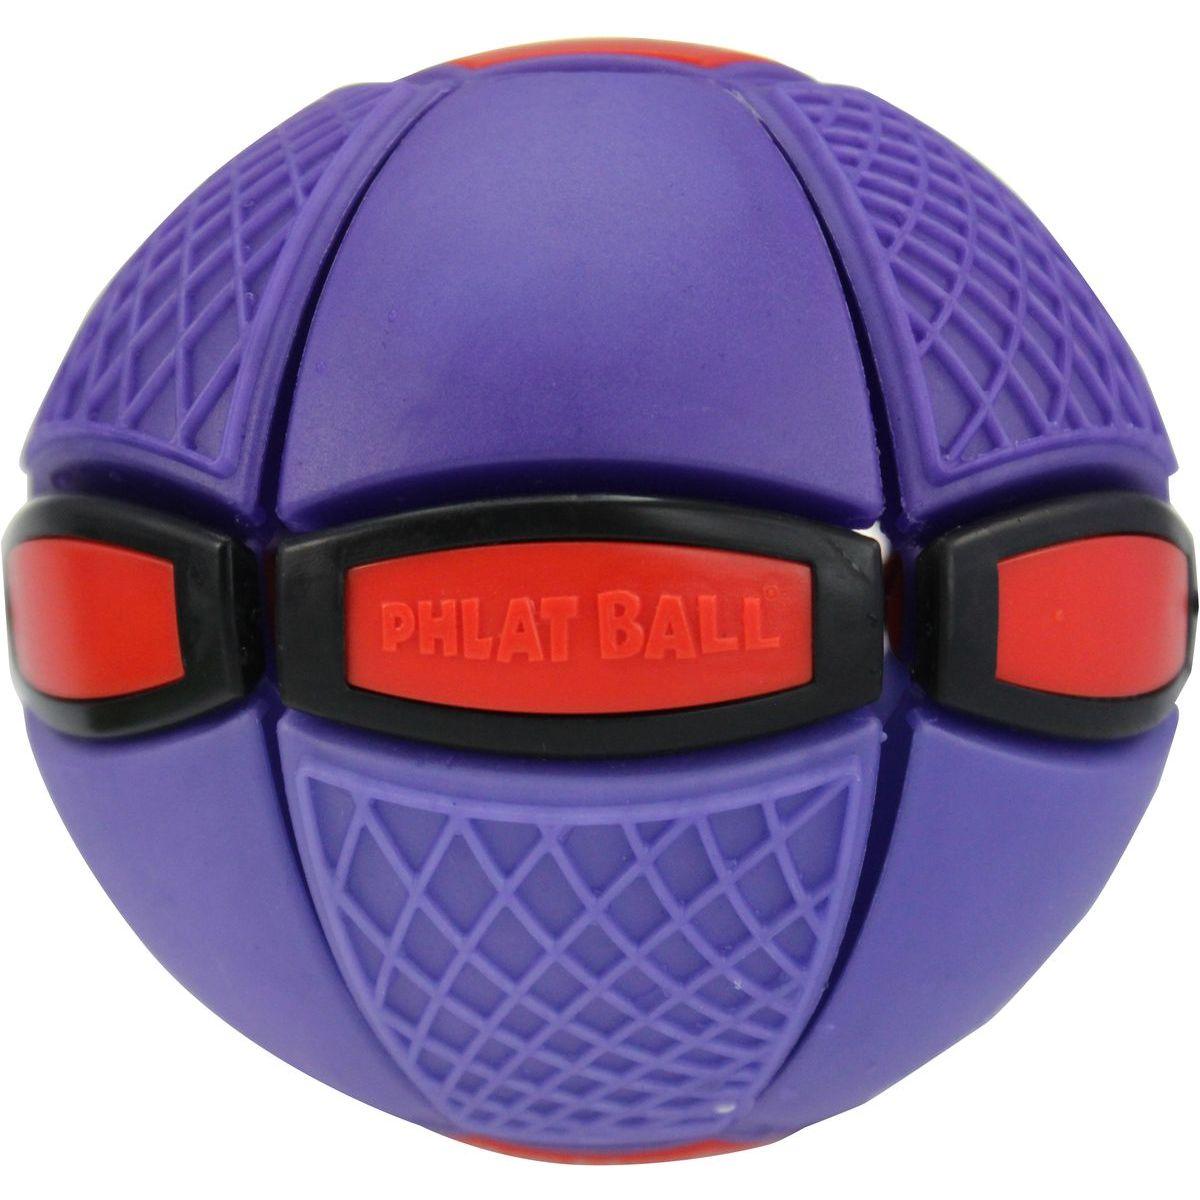 Phlat Ball Chameleon JR Meniaci farbu fialový